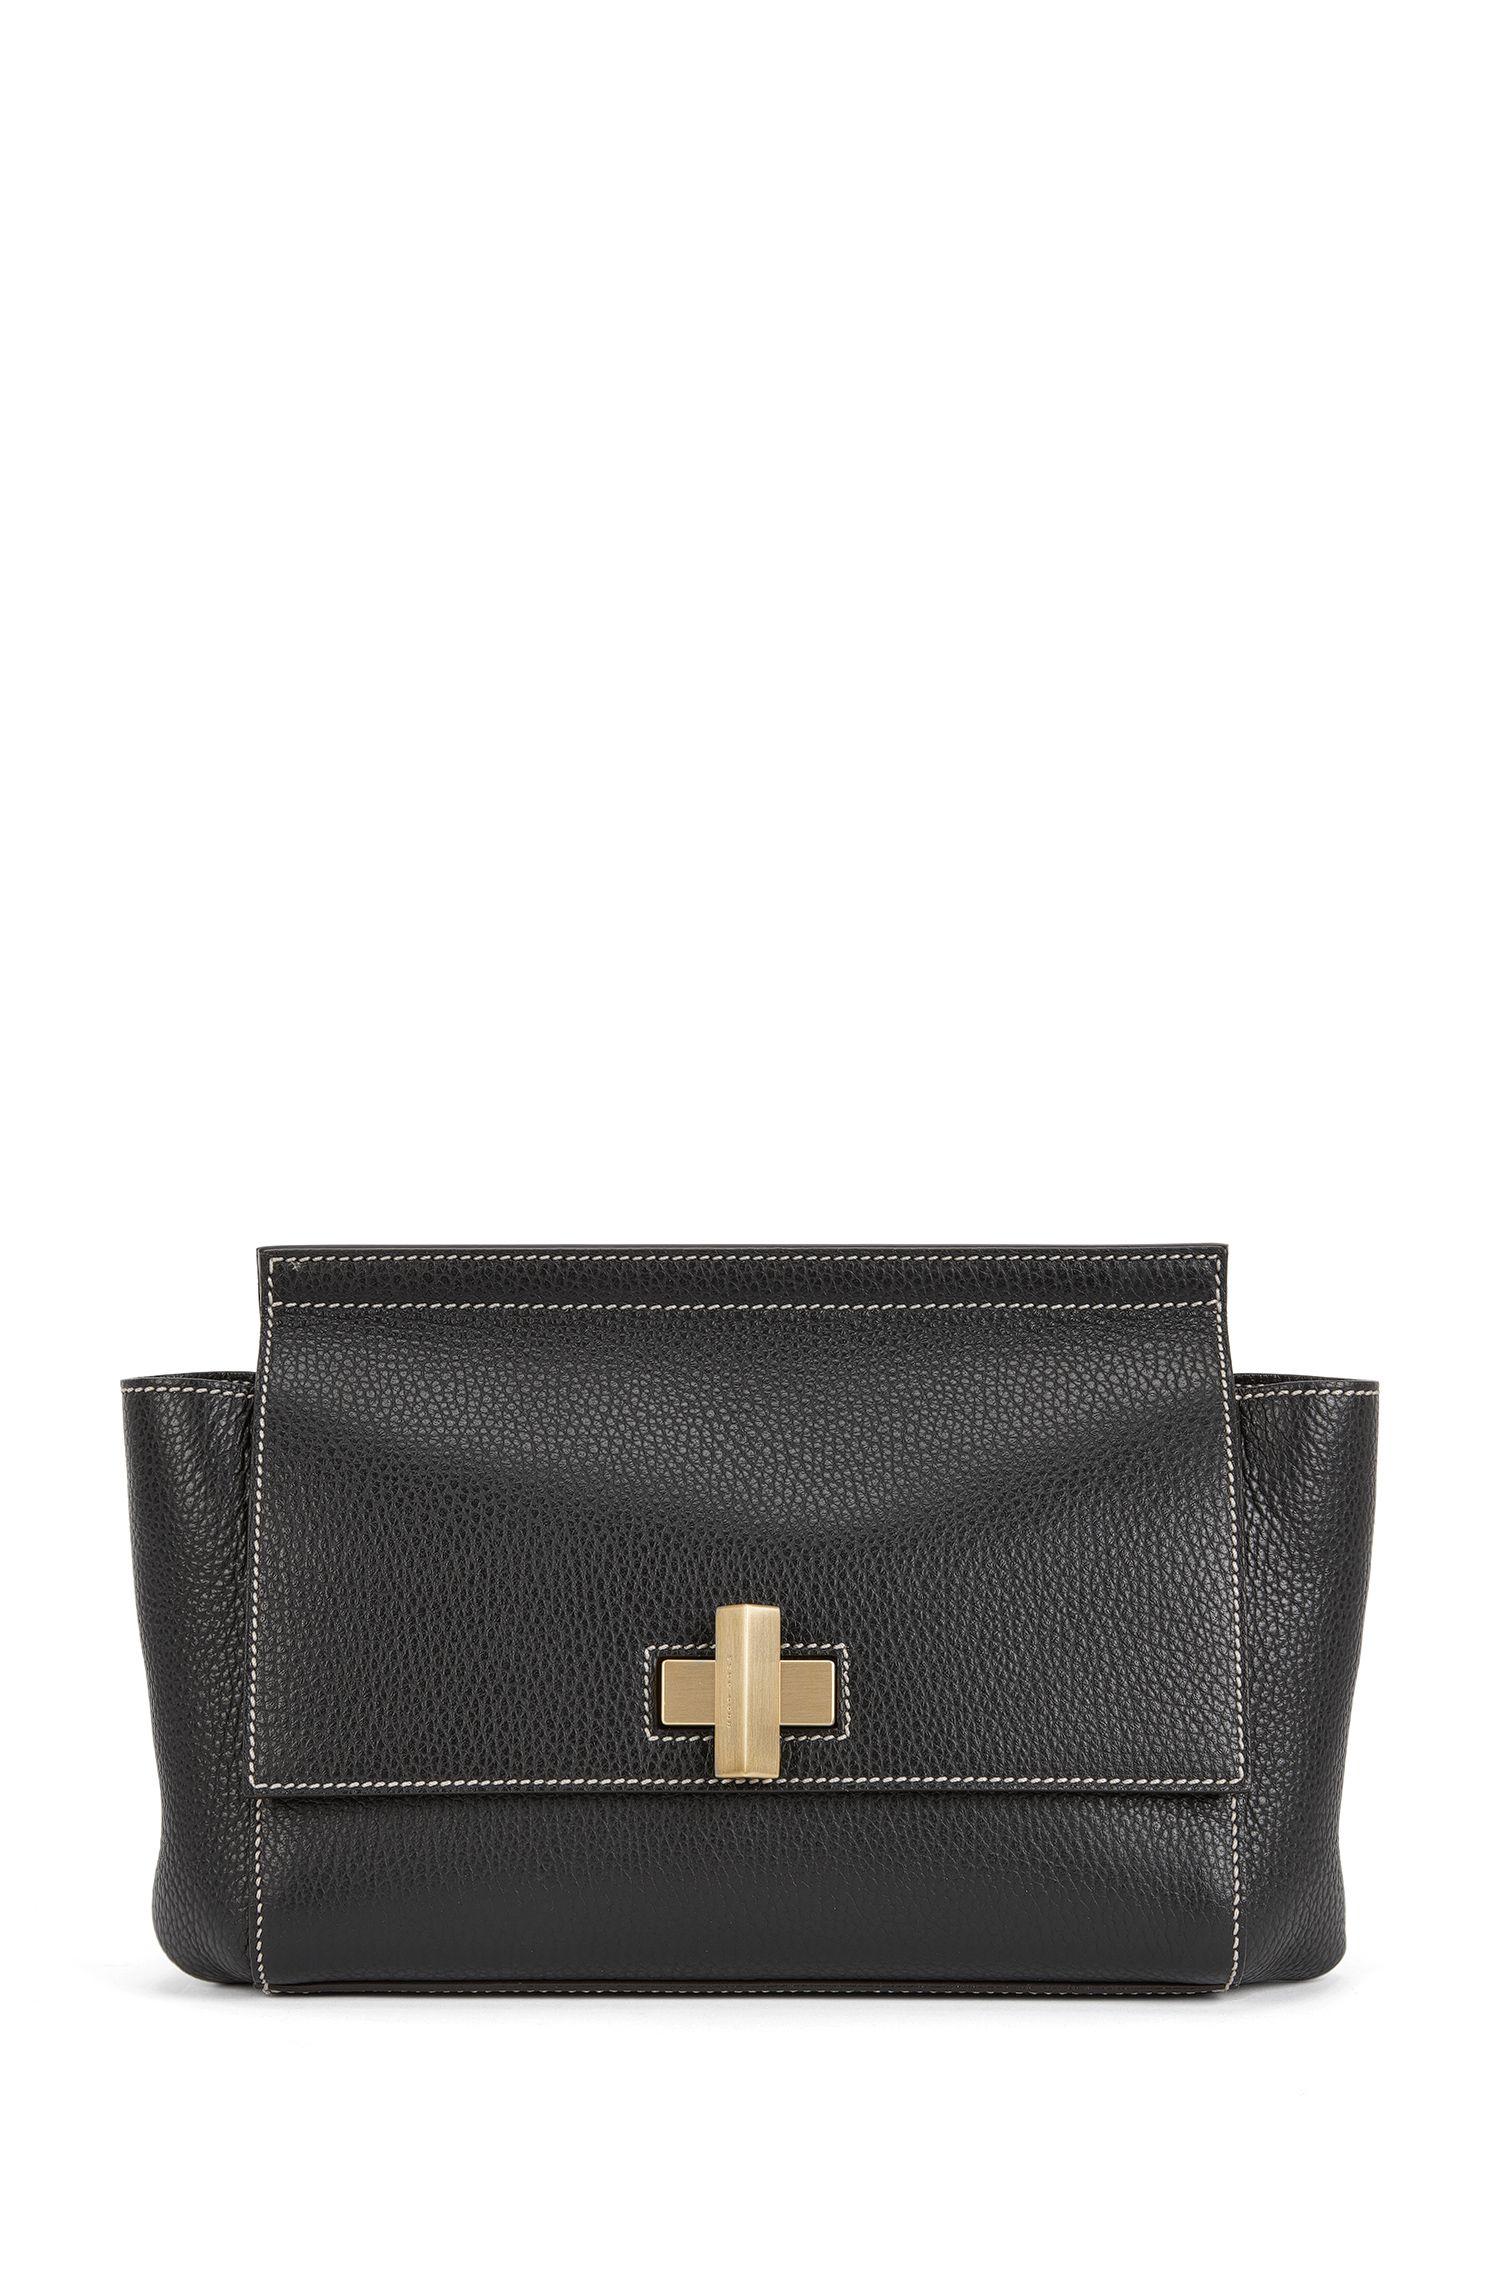 'BOSS Bespoke Soft C' | Leather Grained Satchel Handbag, Detachable Shoulder Strap